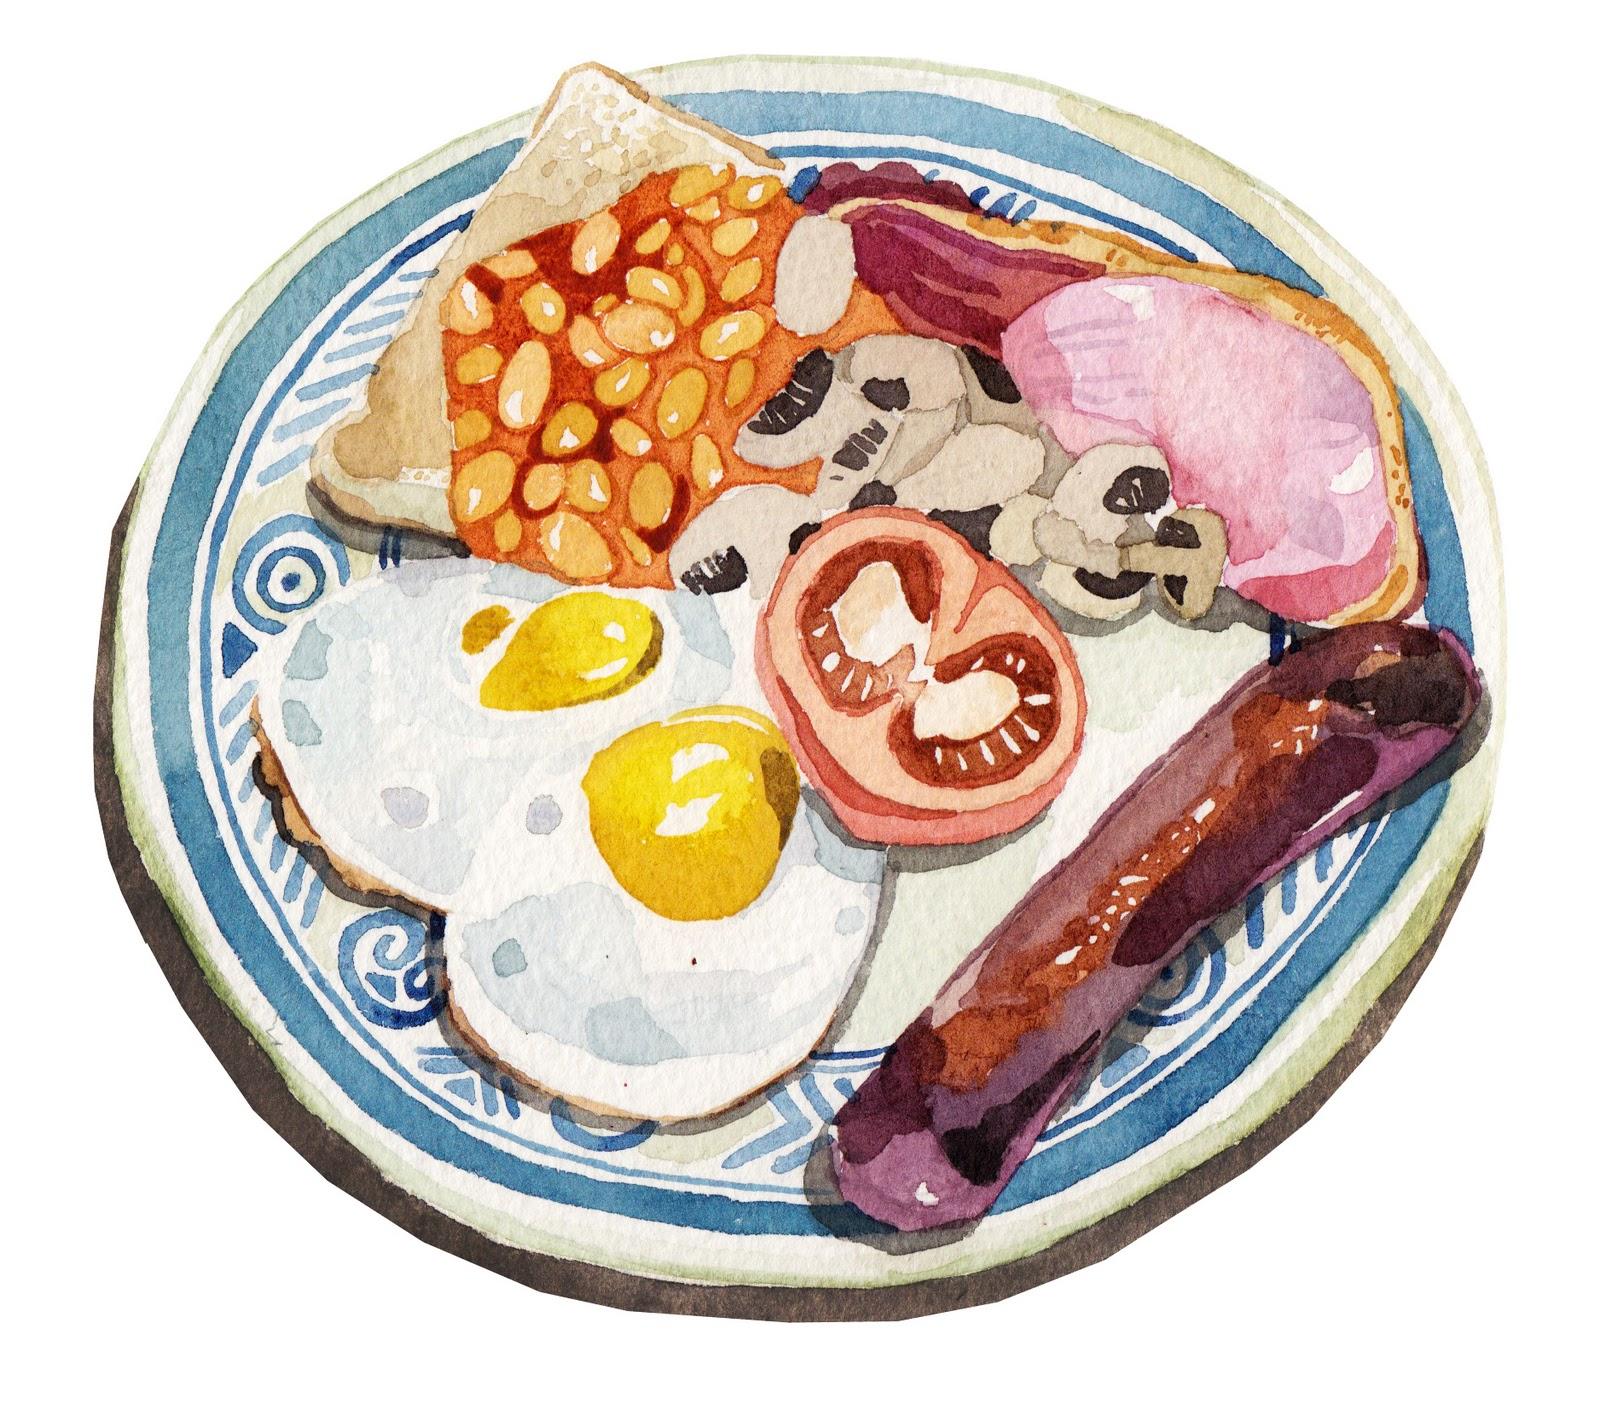 Illustration of food chain